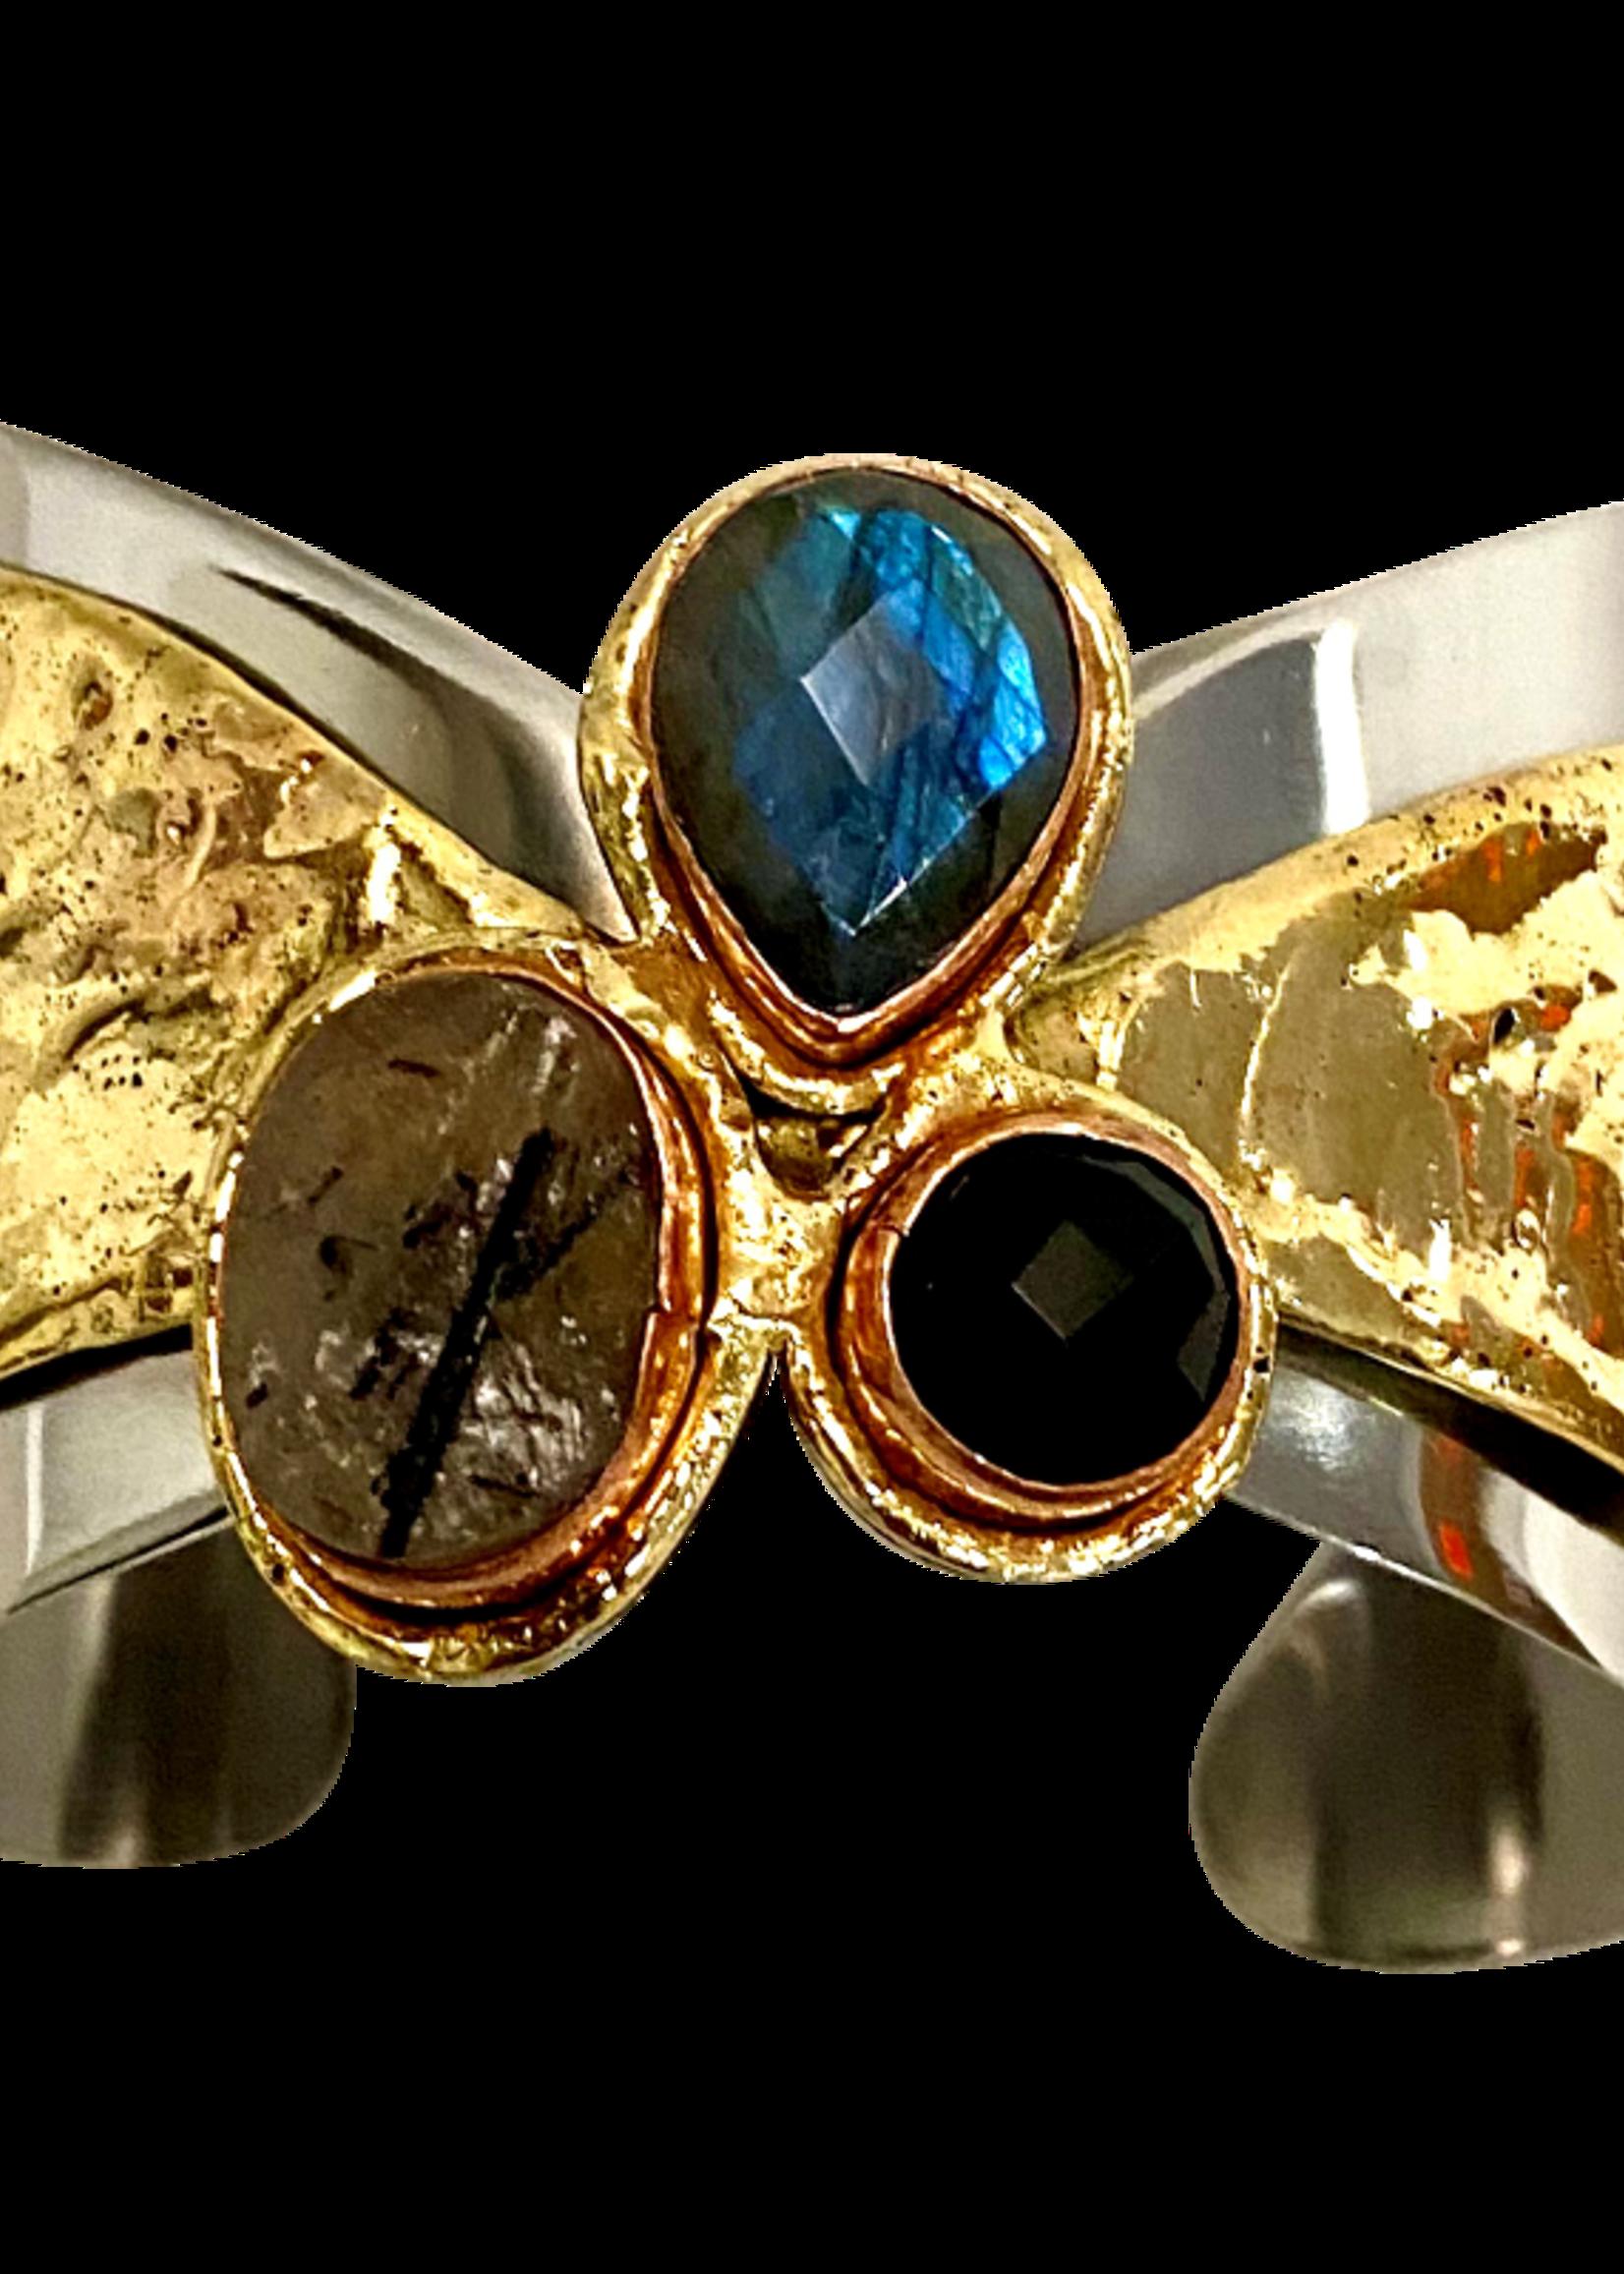 David Jeffery Stainless & Brass Cuff w Labradorite, Black Rutile, & Onyx